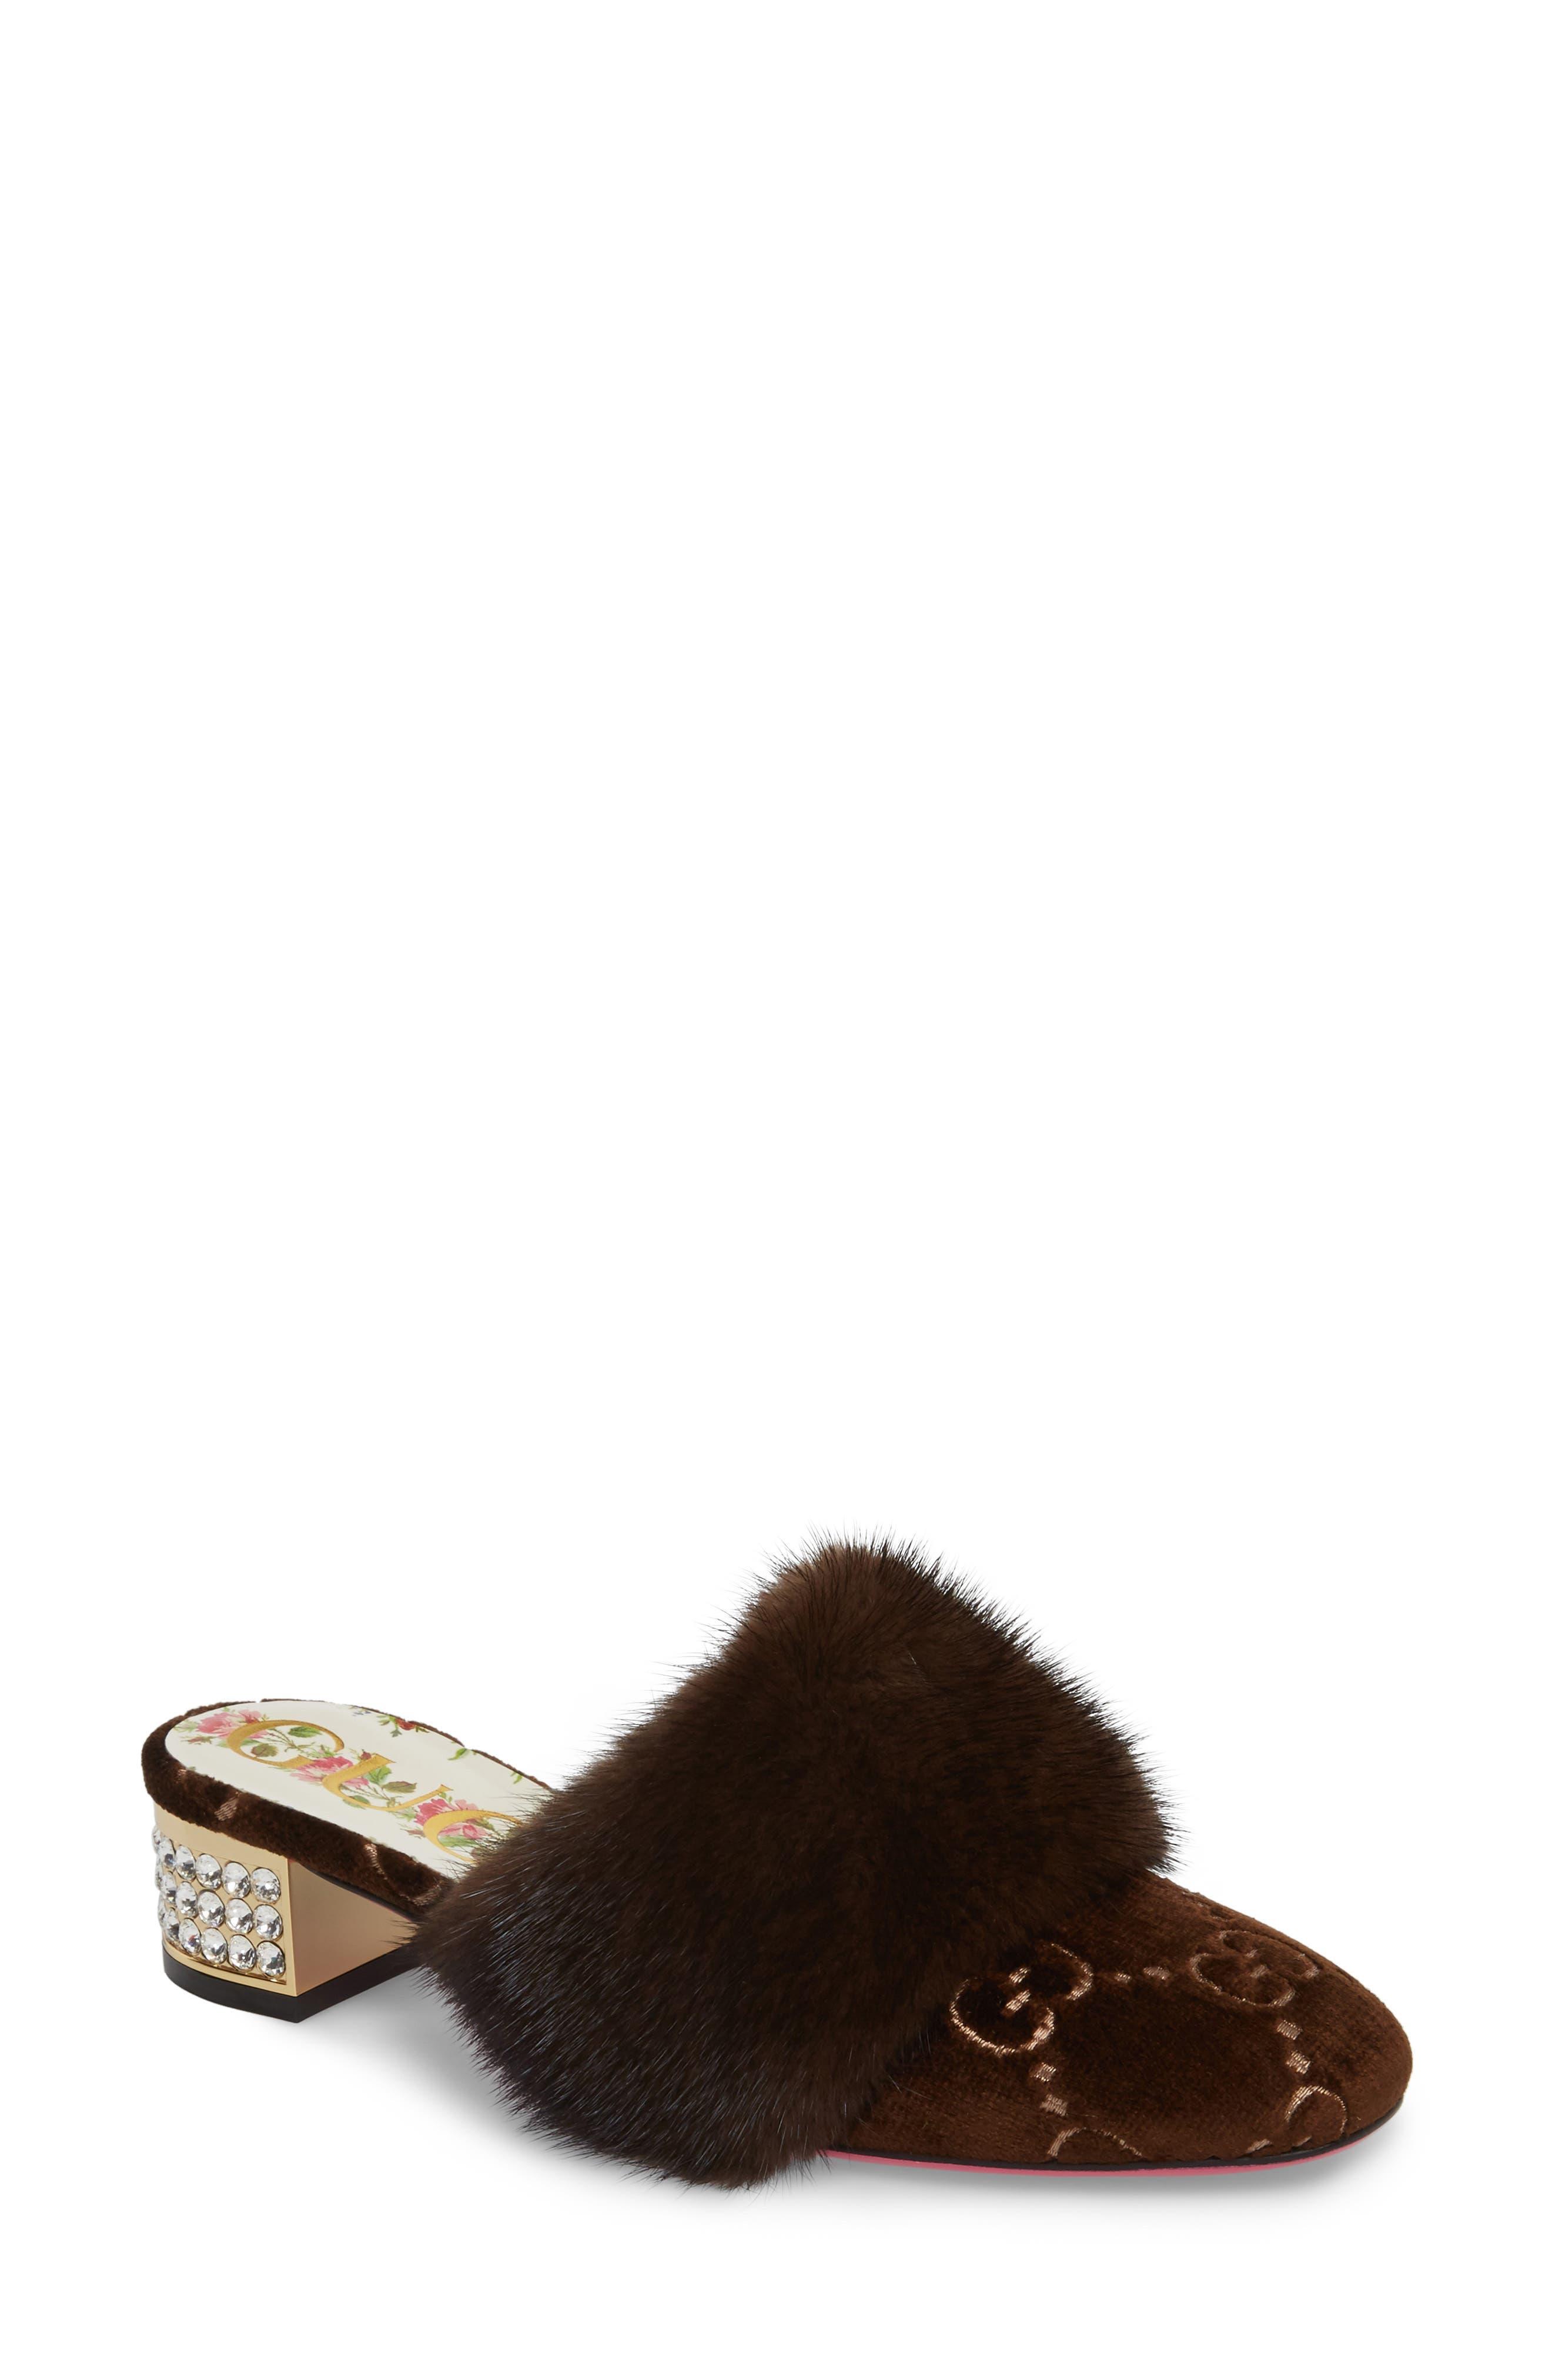 Candy Genuine Mink Fur Mule,                         Main,                         color, MARRONE